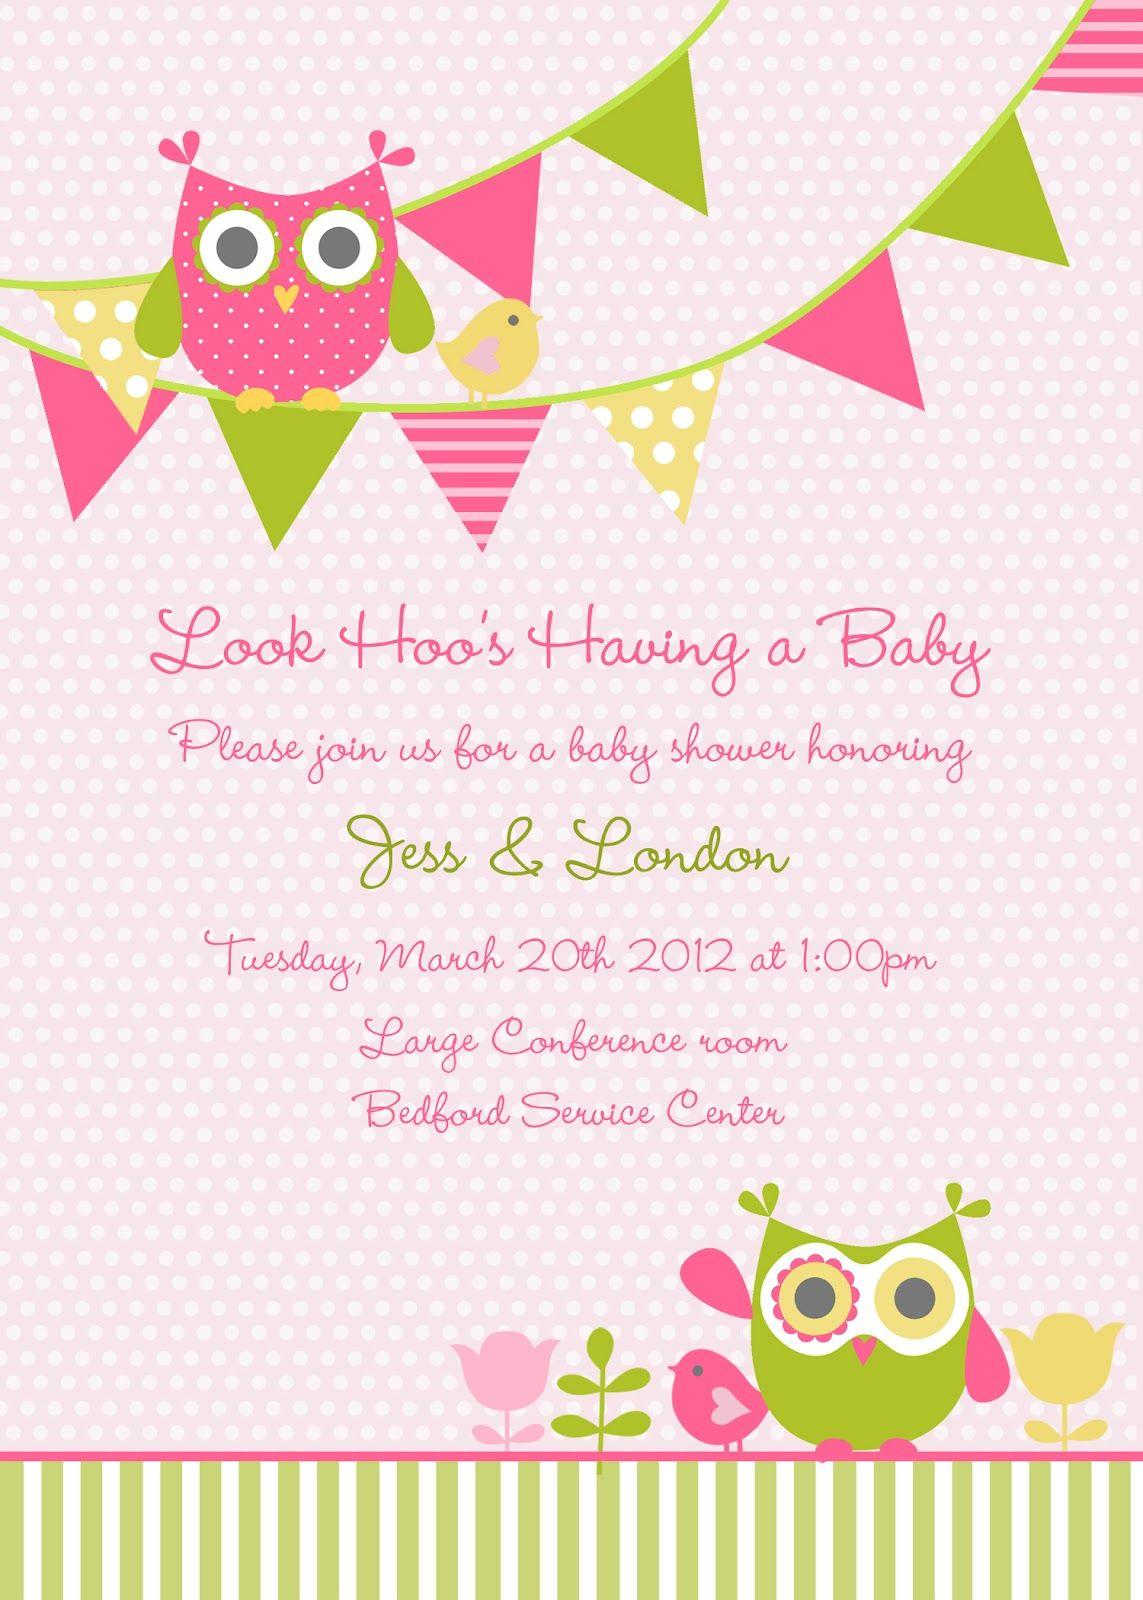 Potluck Baby Shower Invitation Template : potluck, shower, invitation, template, Potluck, Dessert, Shower, Party, Invitations,, Invite, Template,, Invitation, Templates